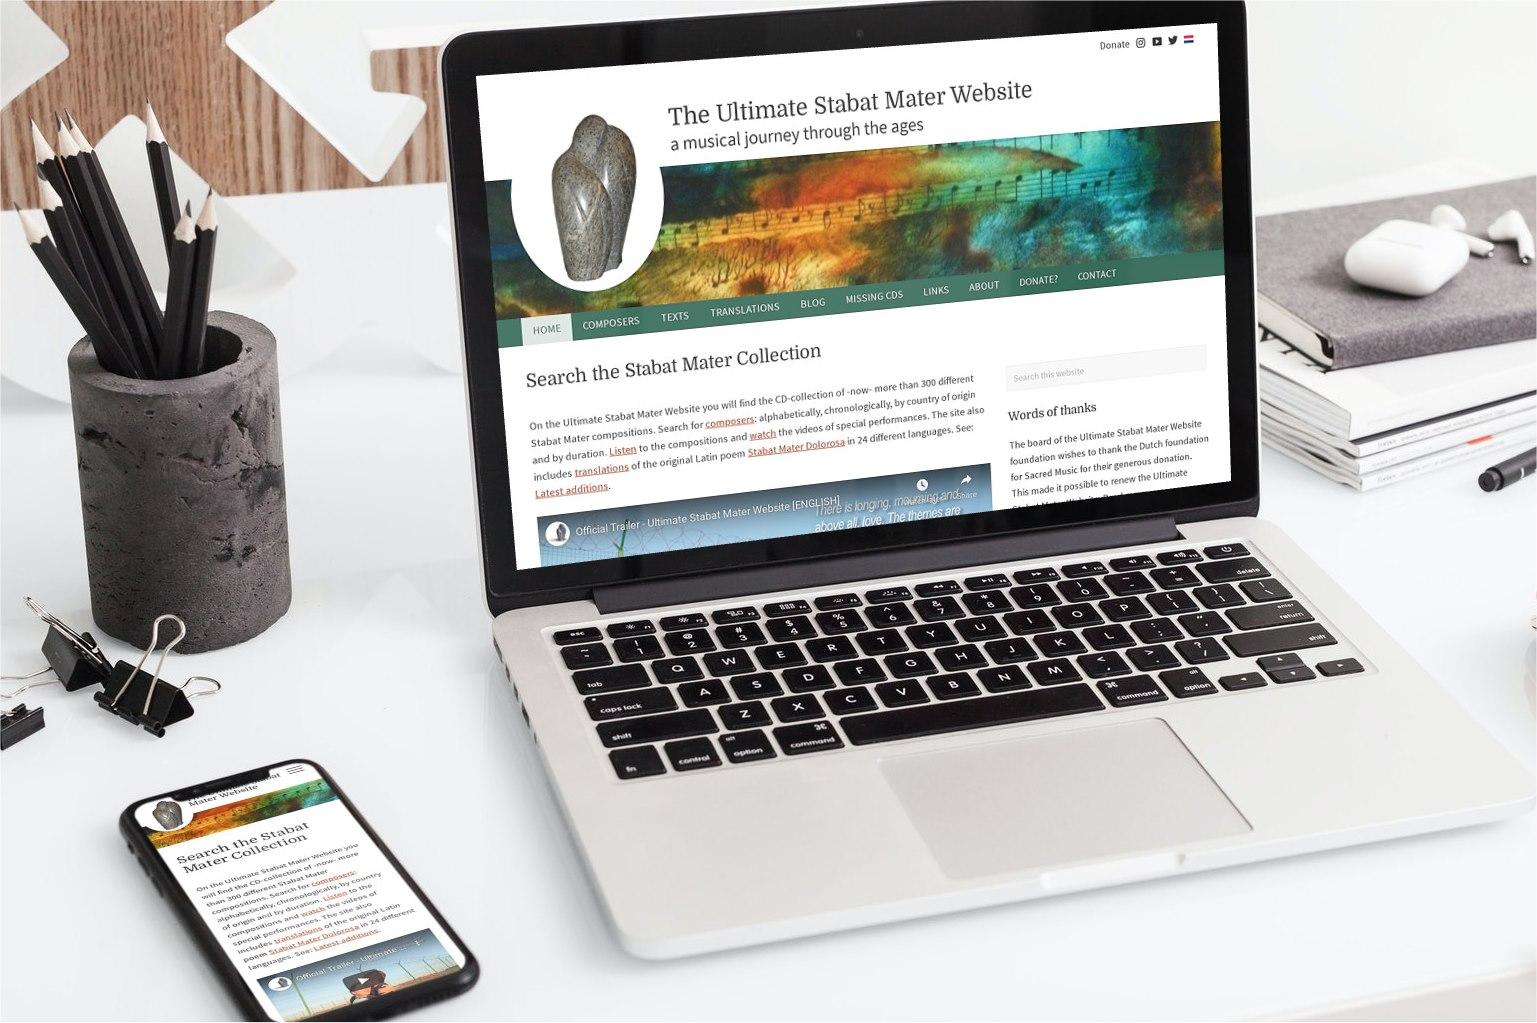 stabat-mater-website-google-seo